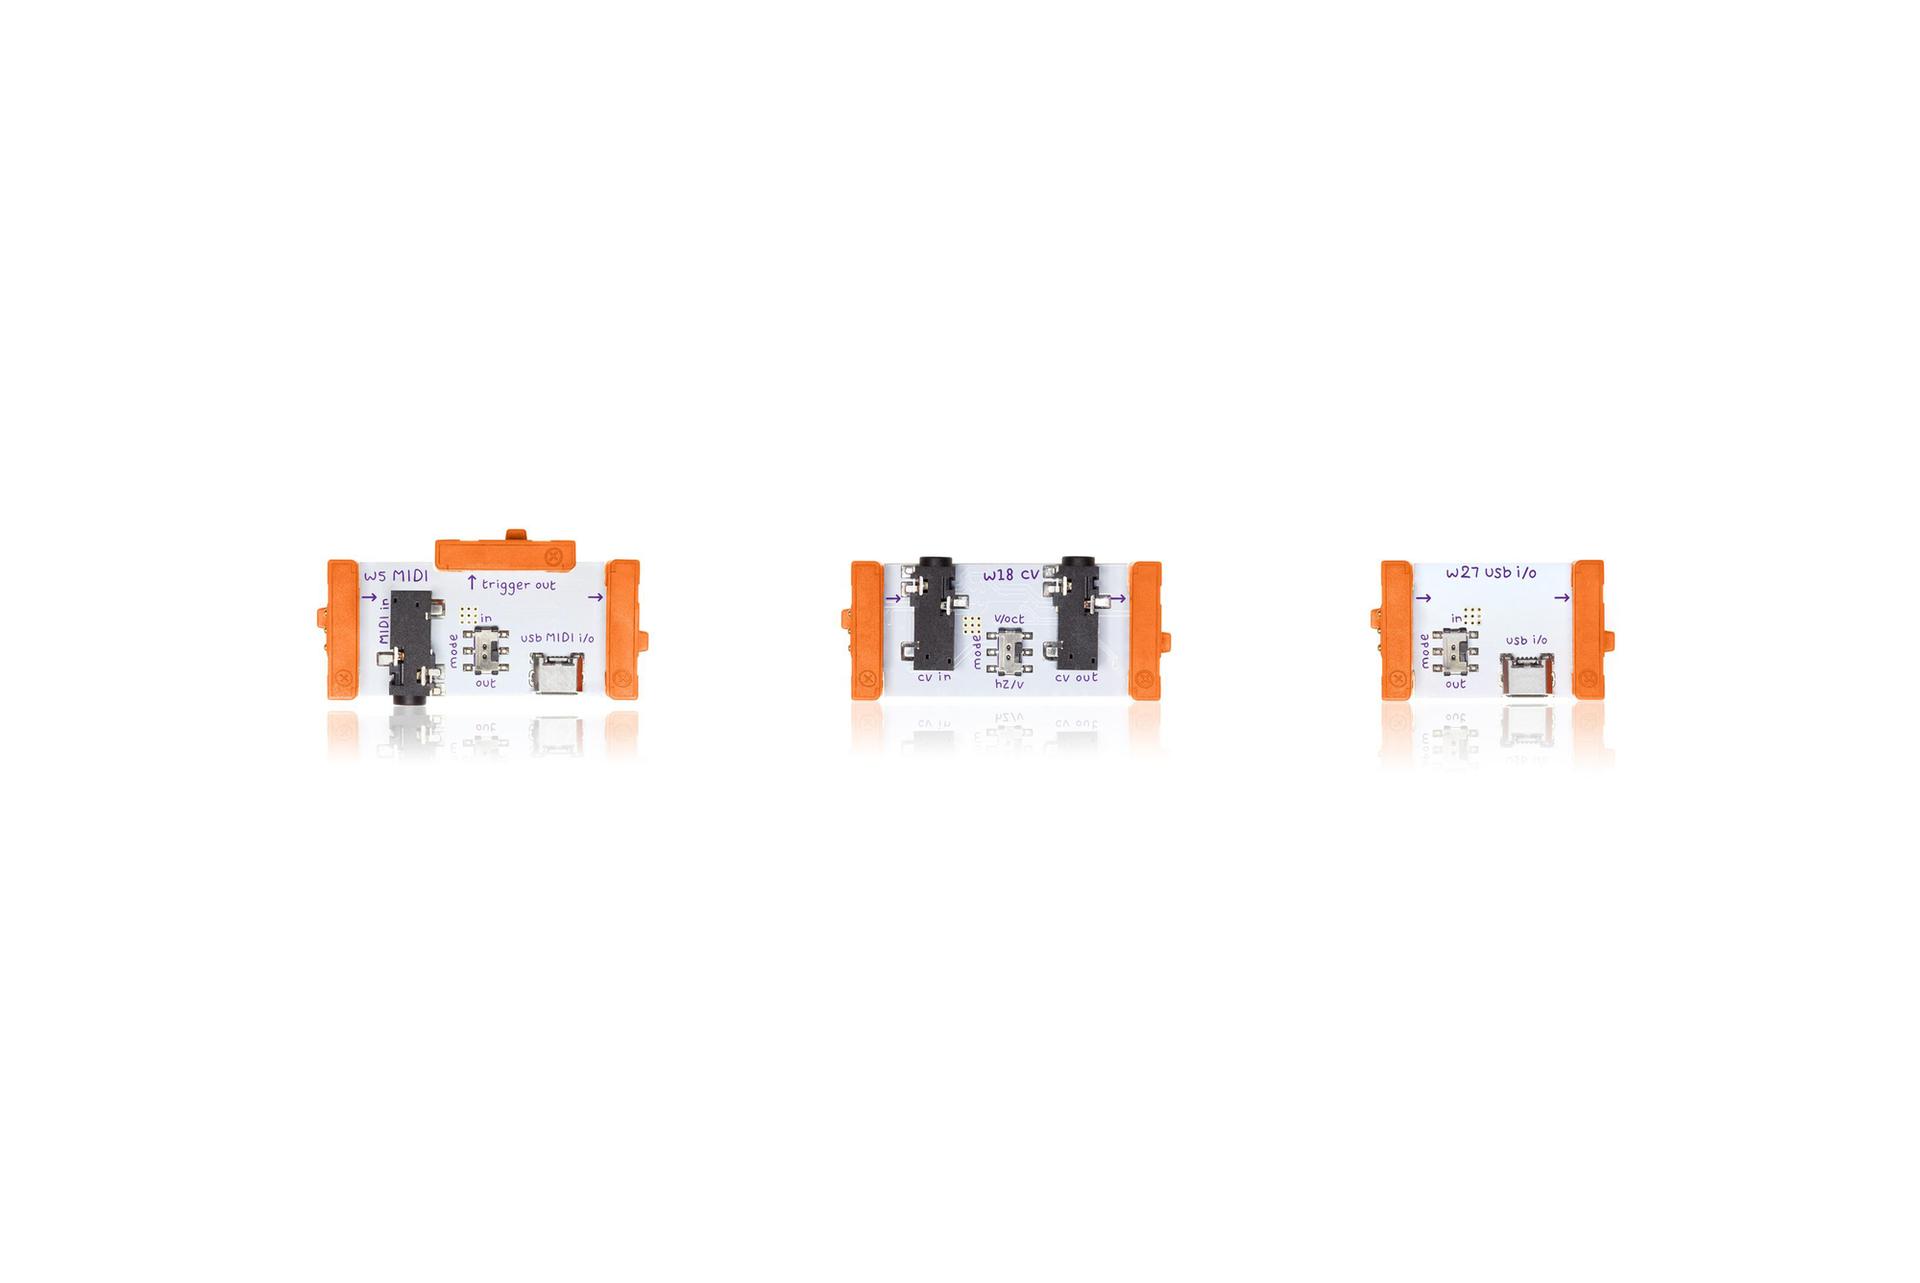 2015 littleBits MIDI / CV / USB IO